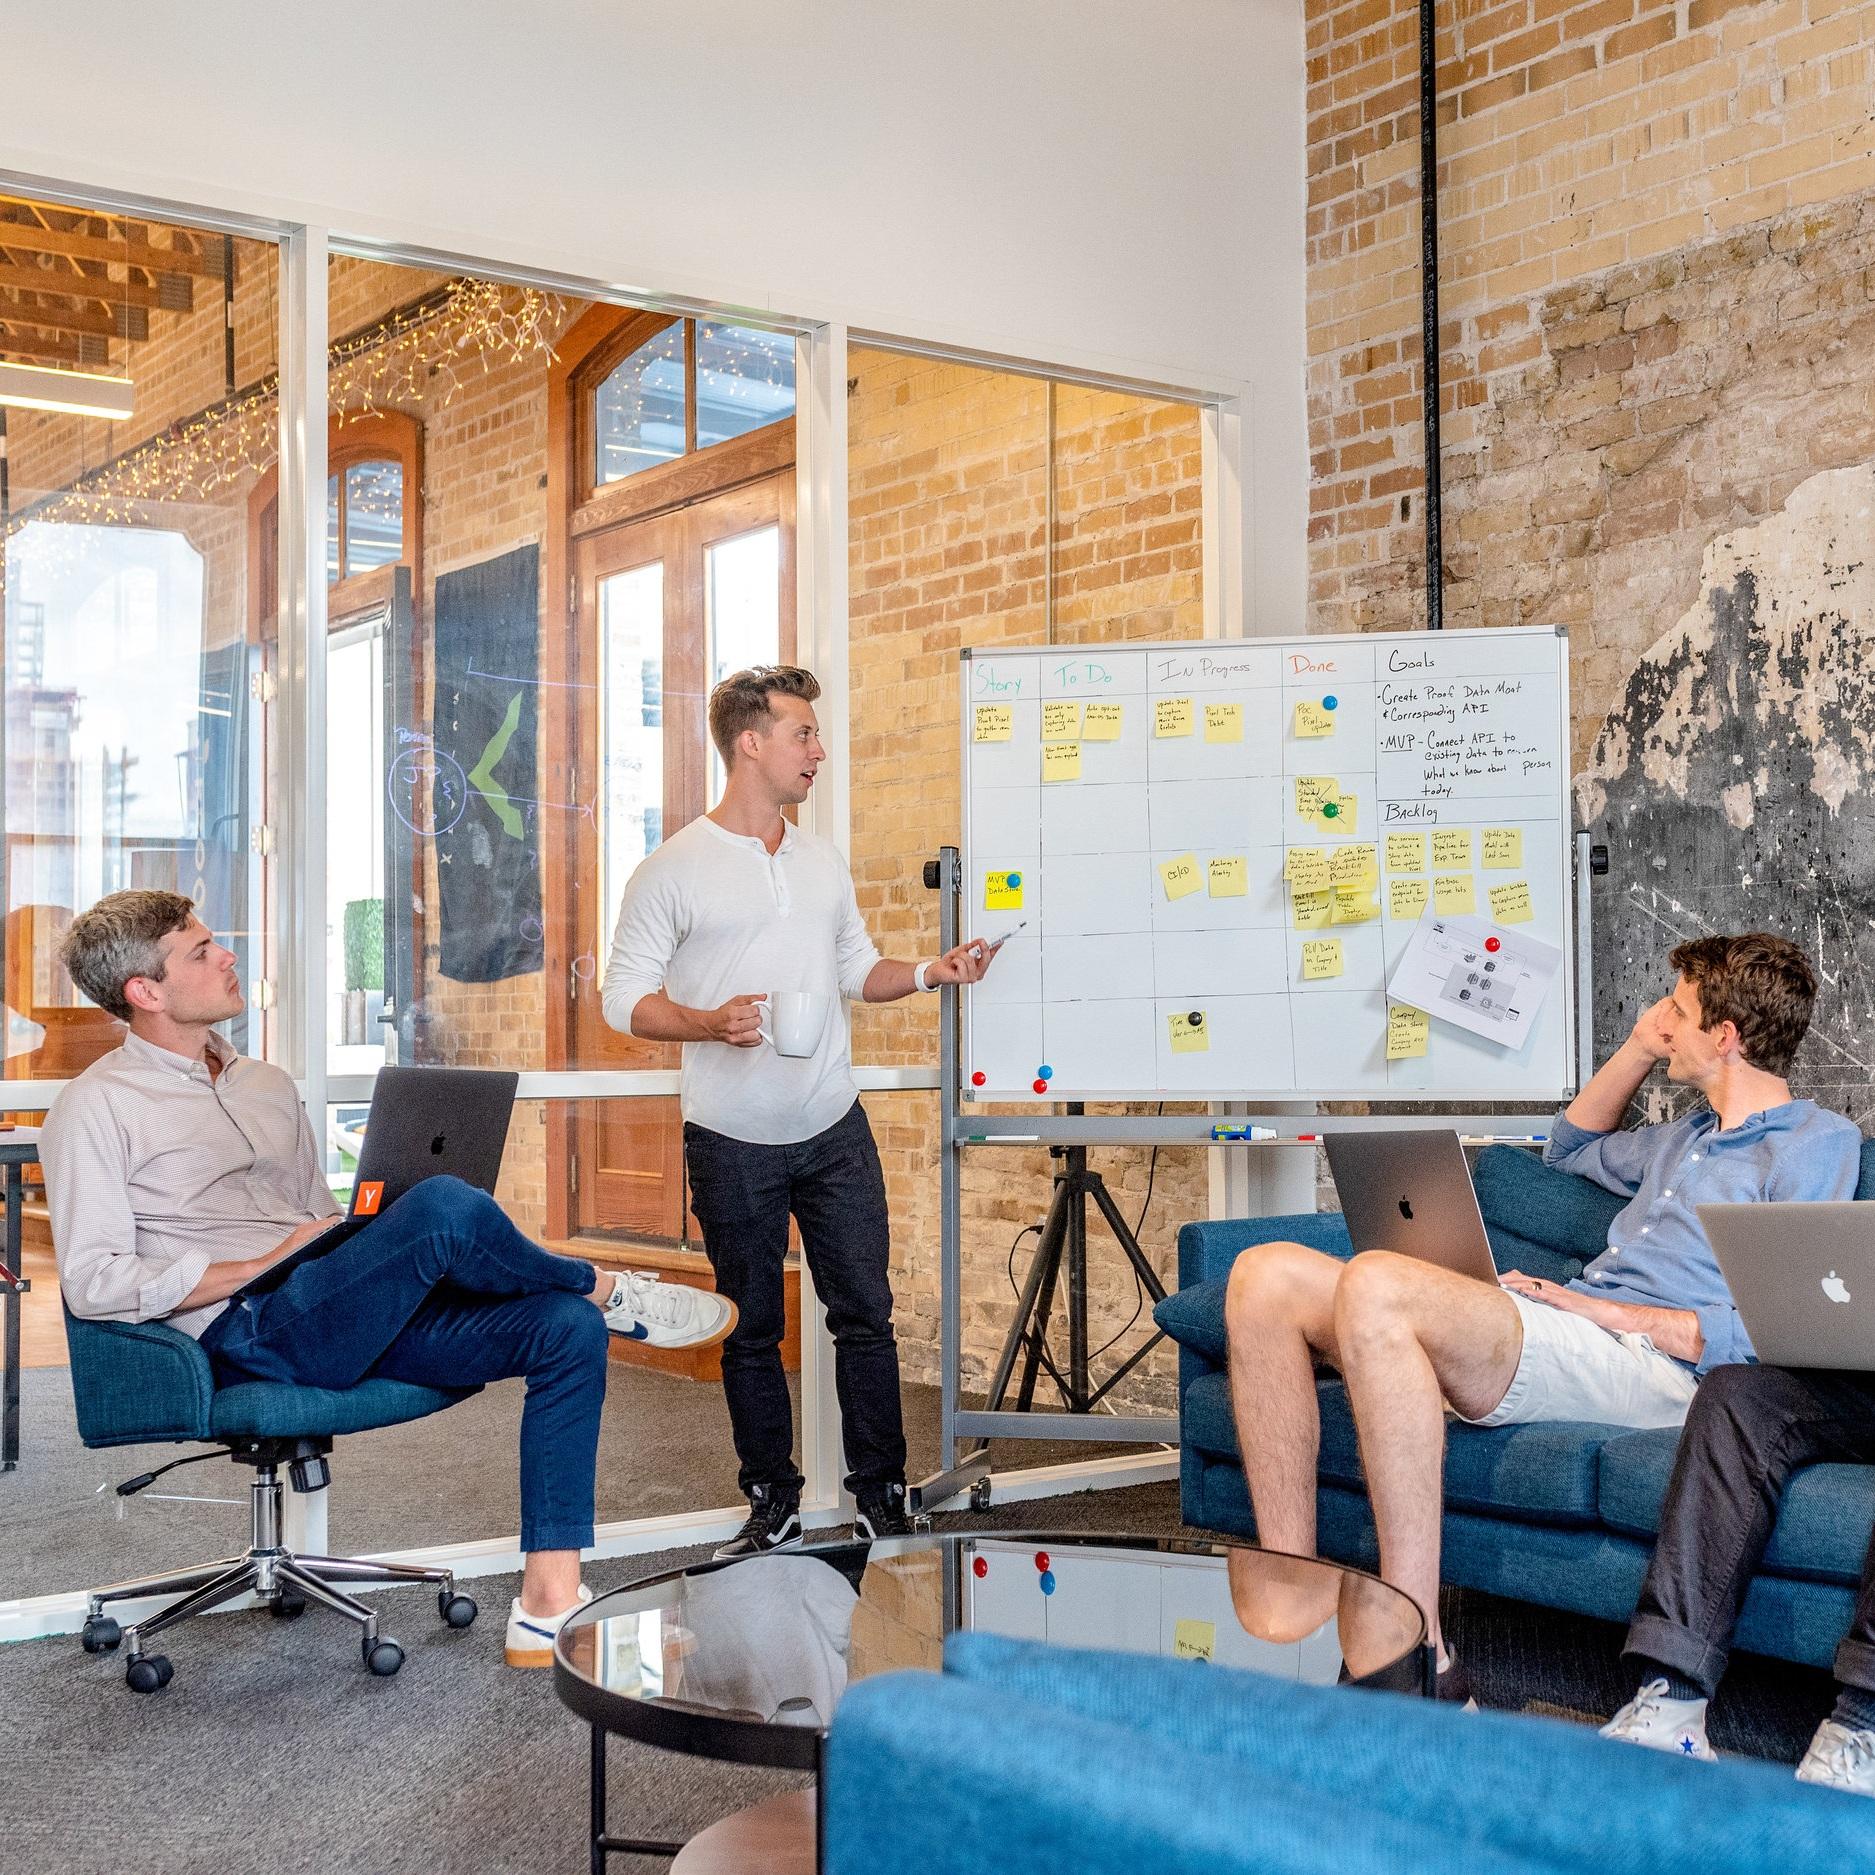 RETAILING - 360 Approach AnalysisResearch and DiscoveryConsumer/Shopper SegmentationConsumer InsightStore Design AnalysisVisual Merchandising